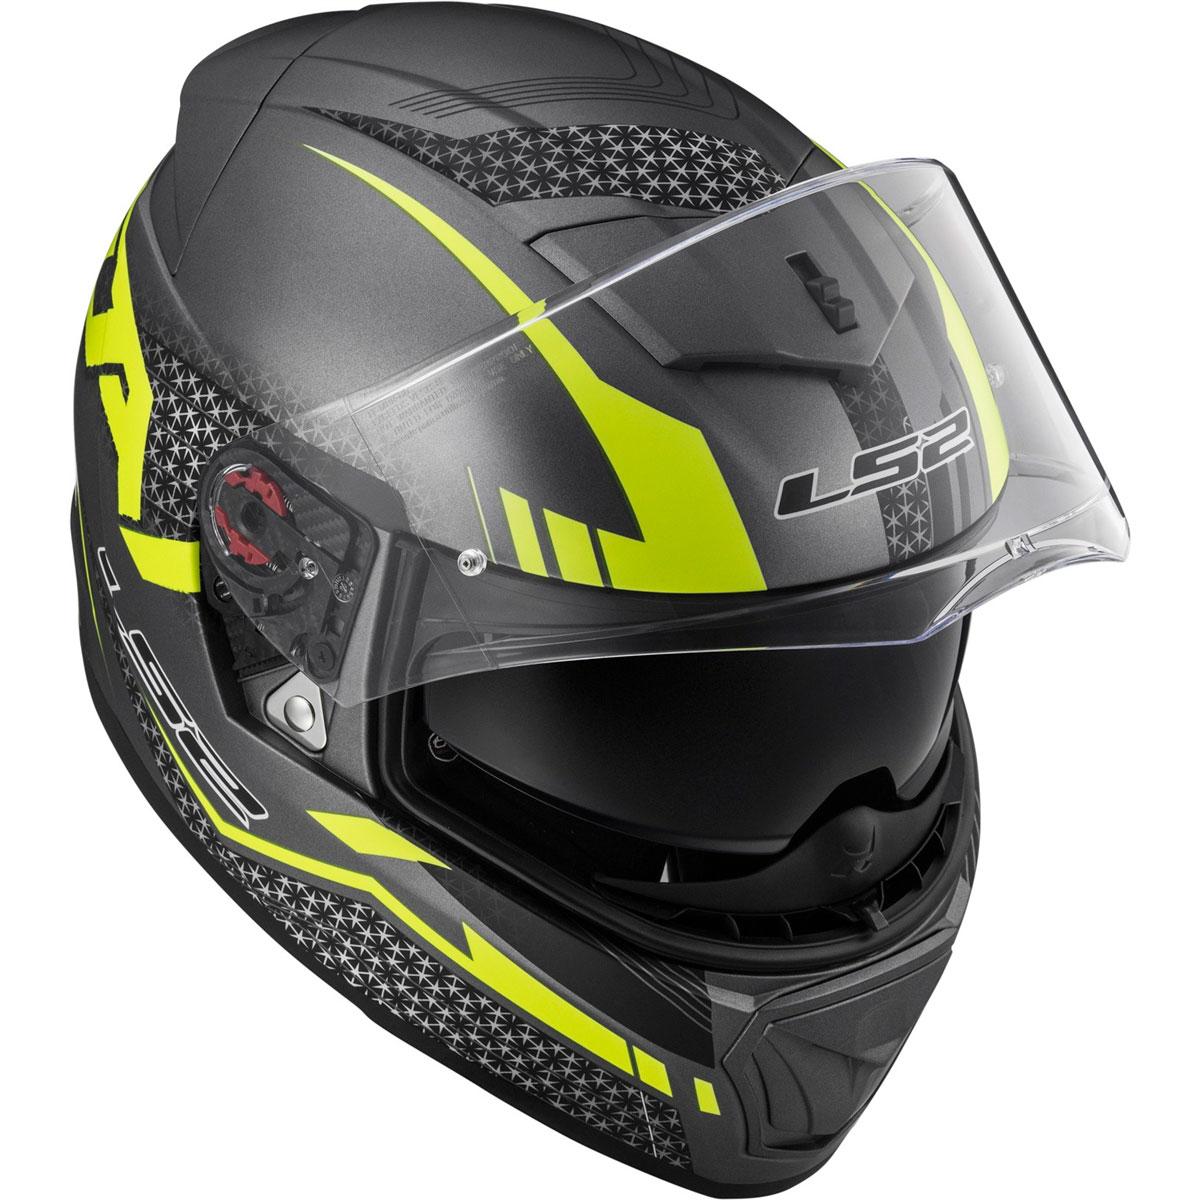 Capacete LS2 FF390 Breaker Spit Matt Titanium  HV Amarelo  - Nova Centro Boutique Roupas para Motociclistas